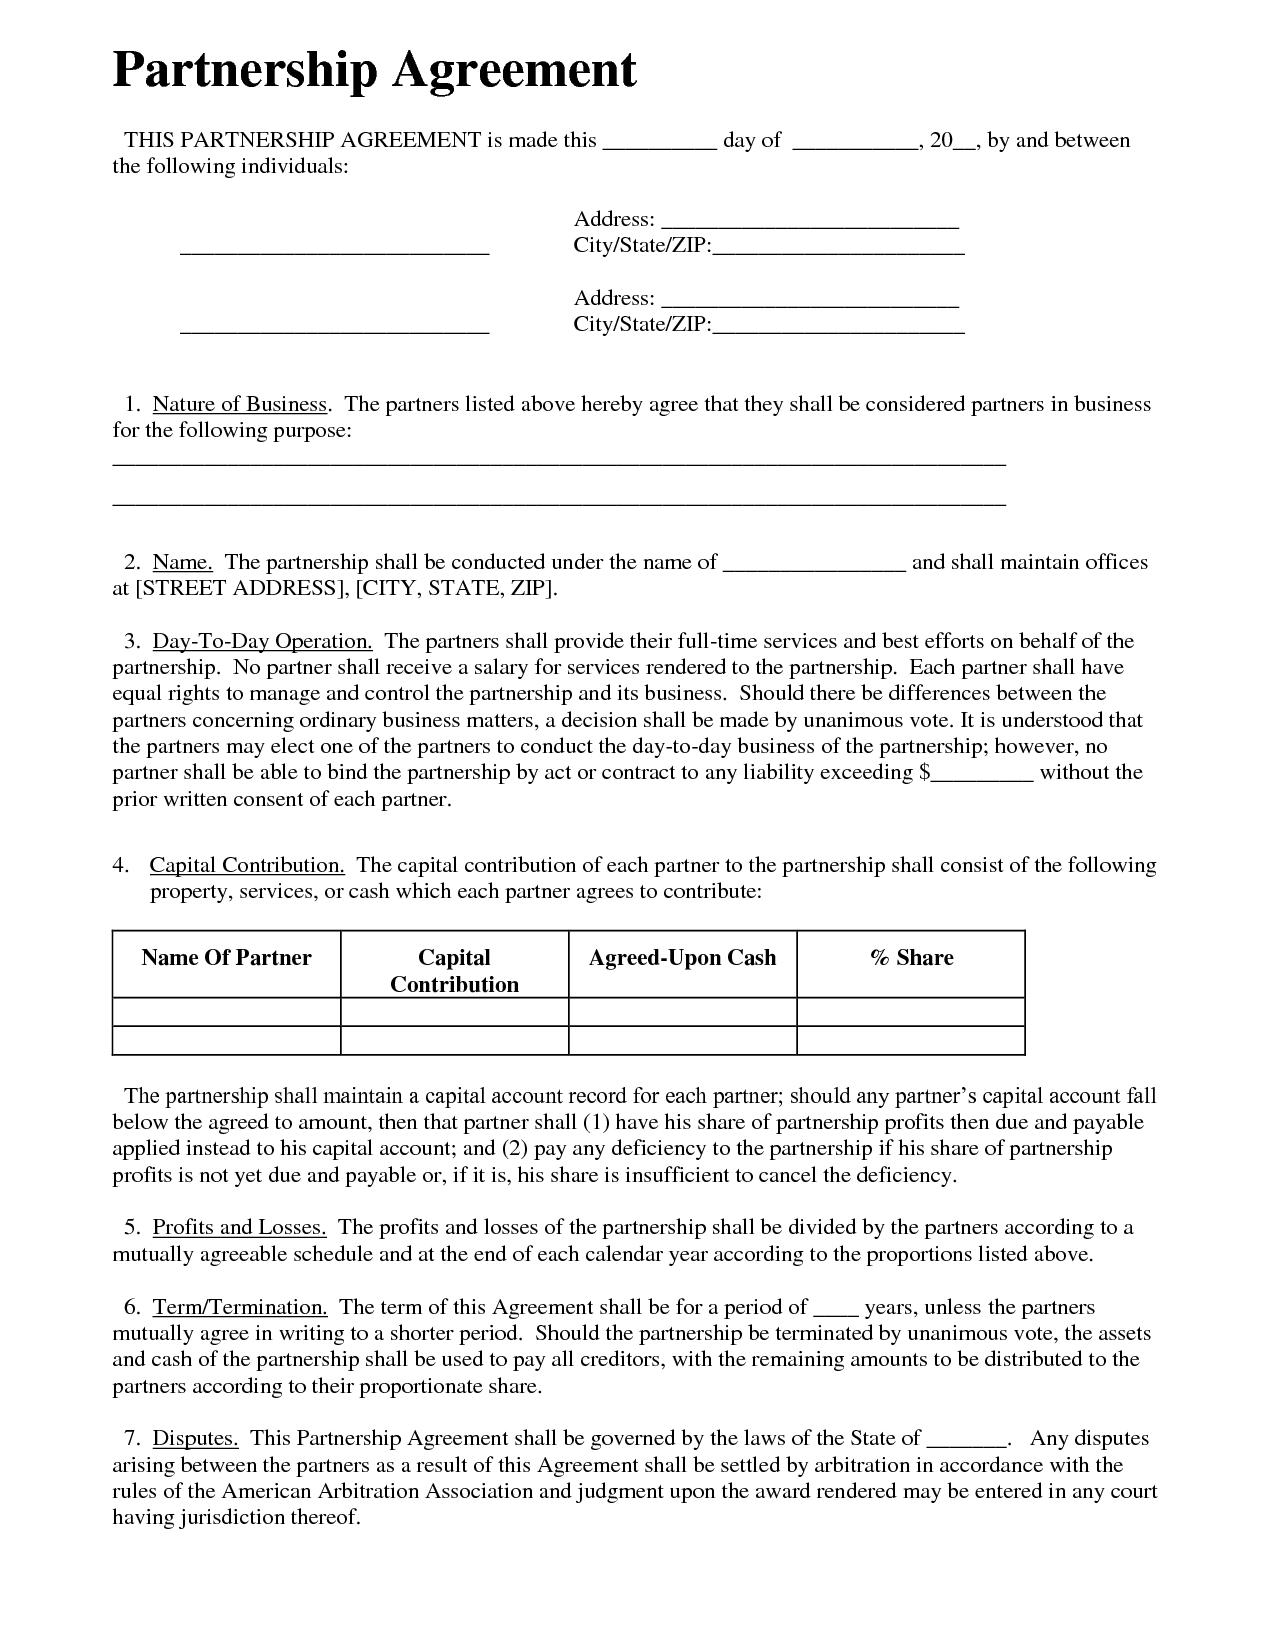 Send A Partnership Agreement By Safwan